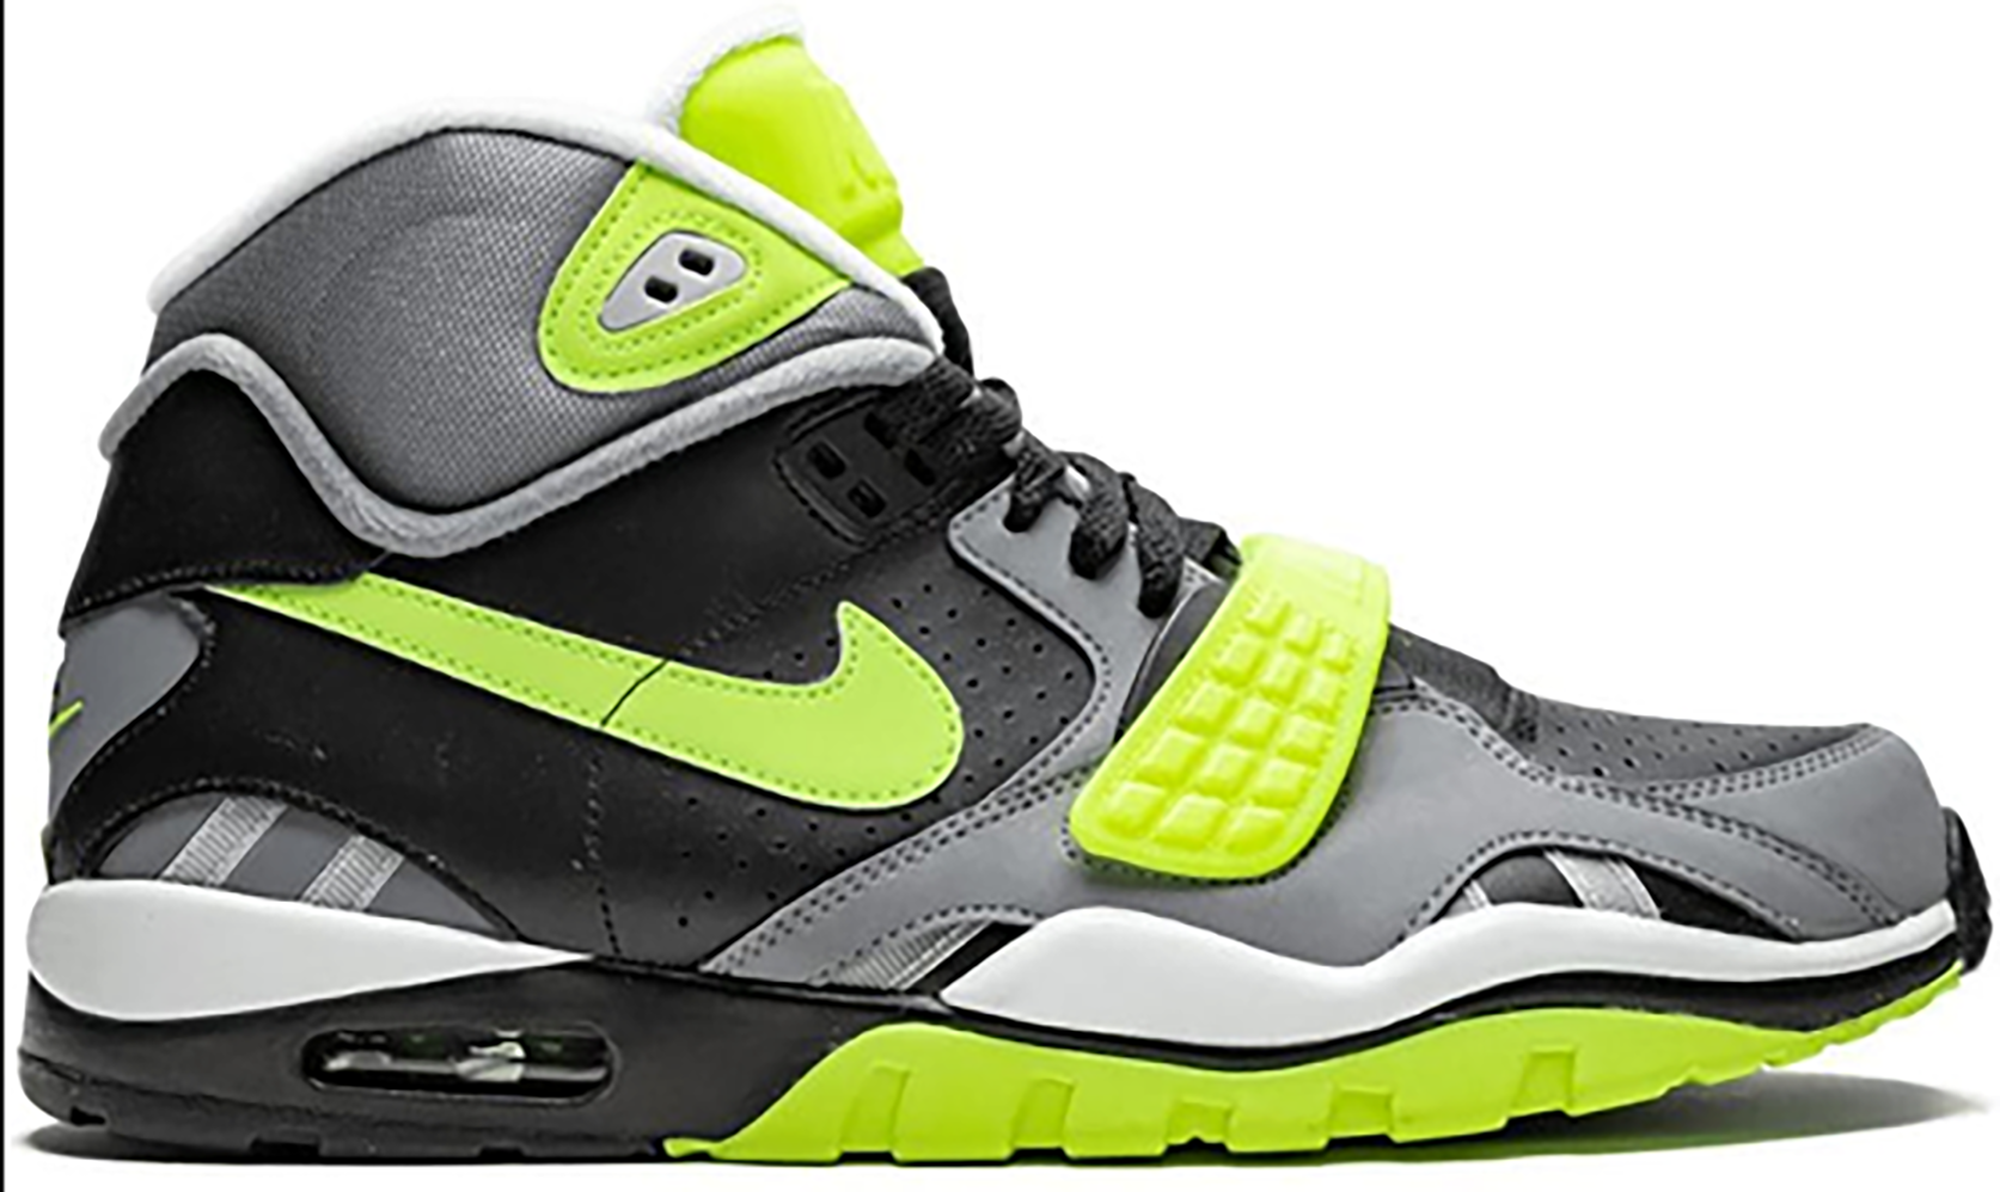 Nike Air Trainer SC 2 Black Volt